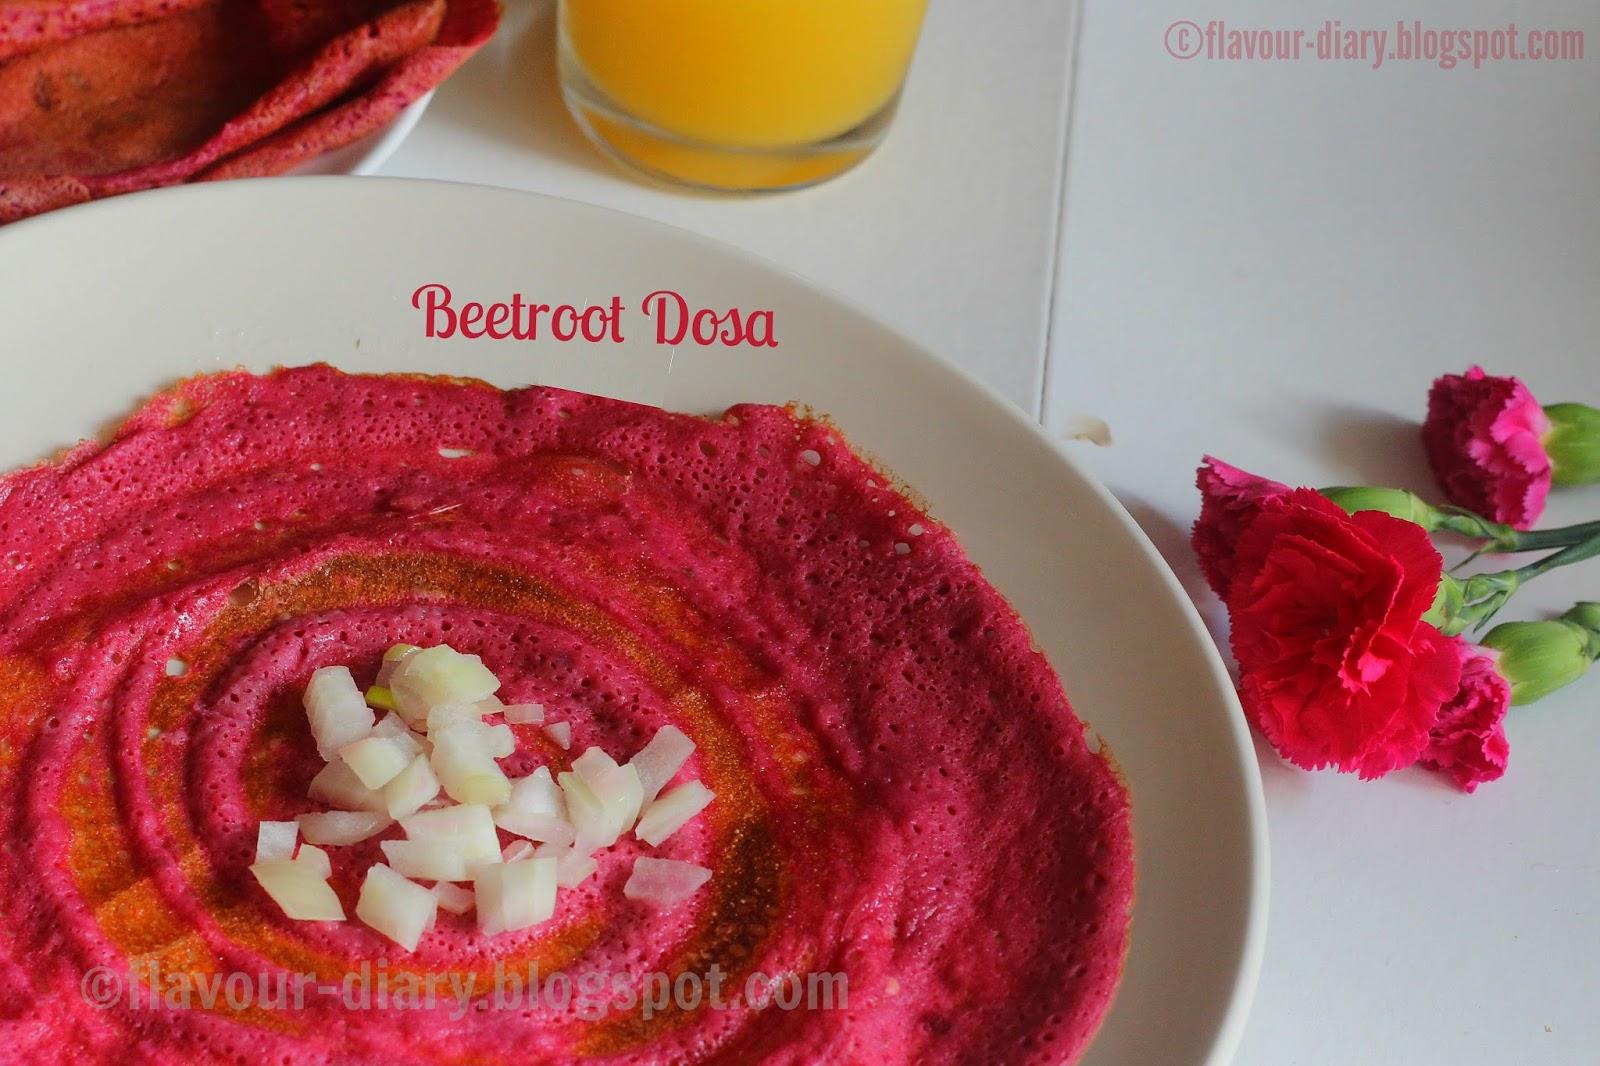 Beetroot Dosa Recipe